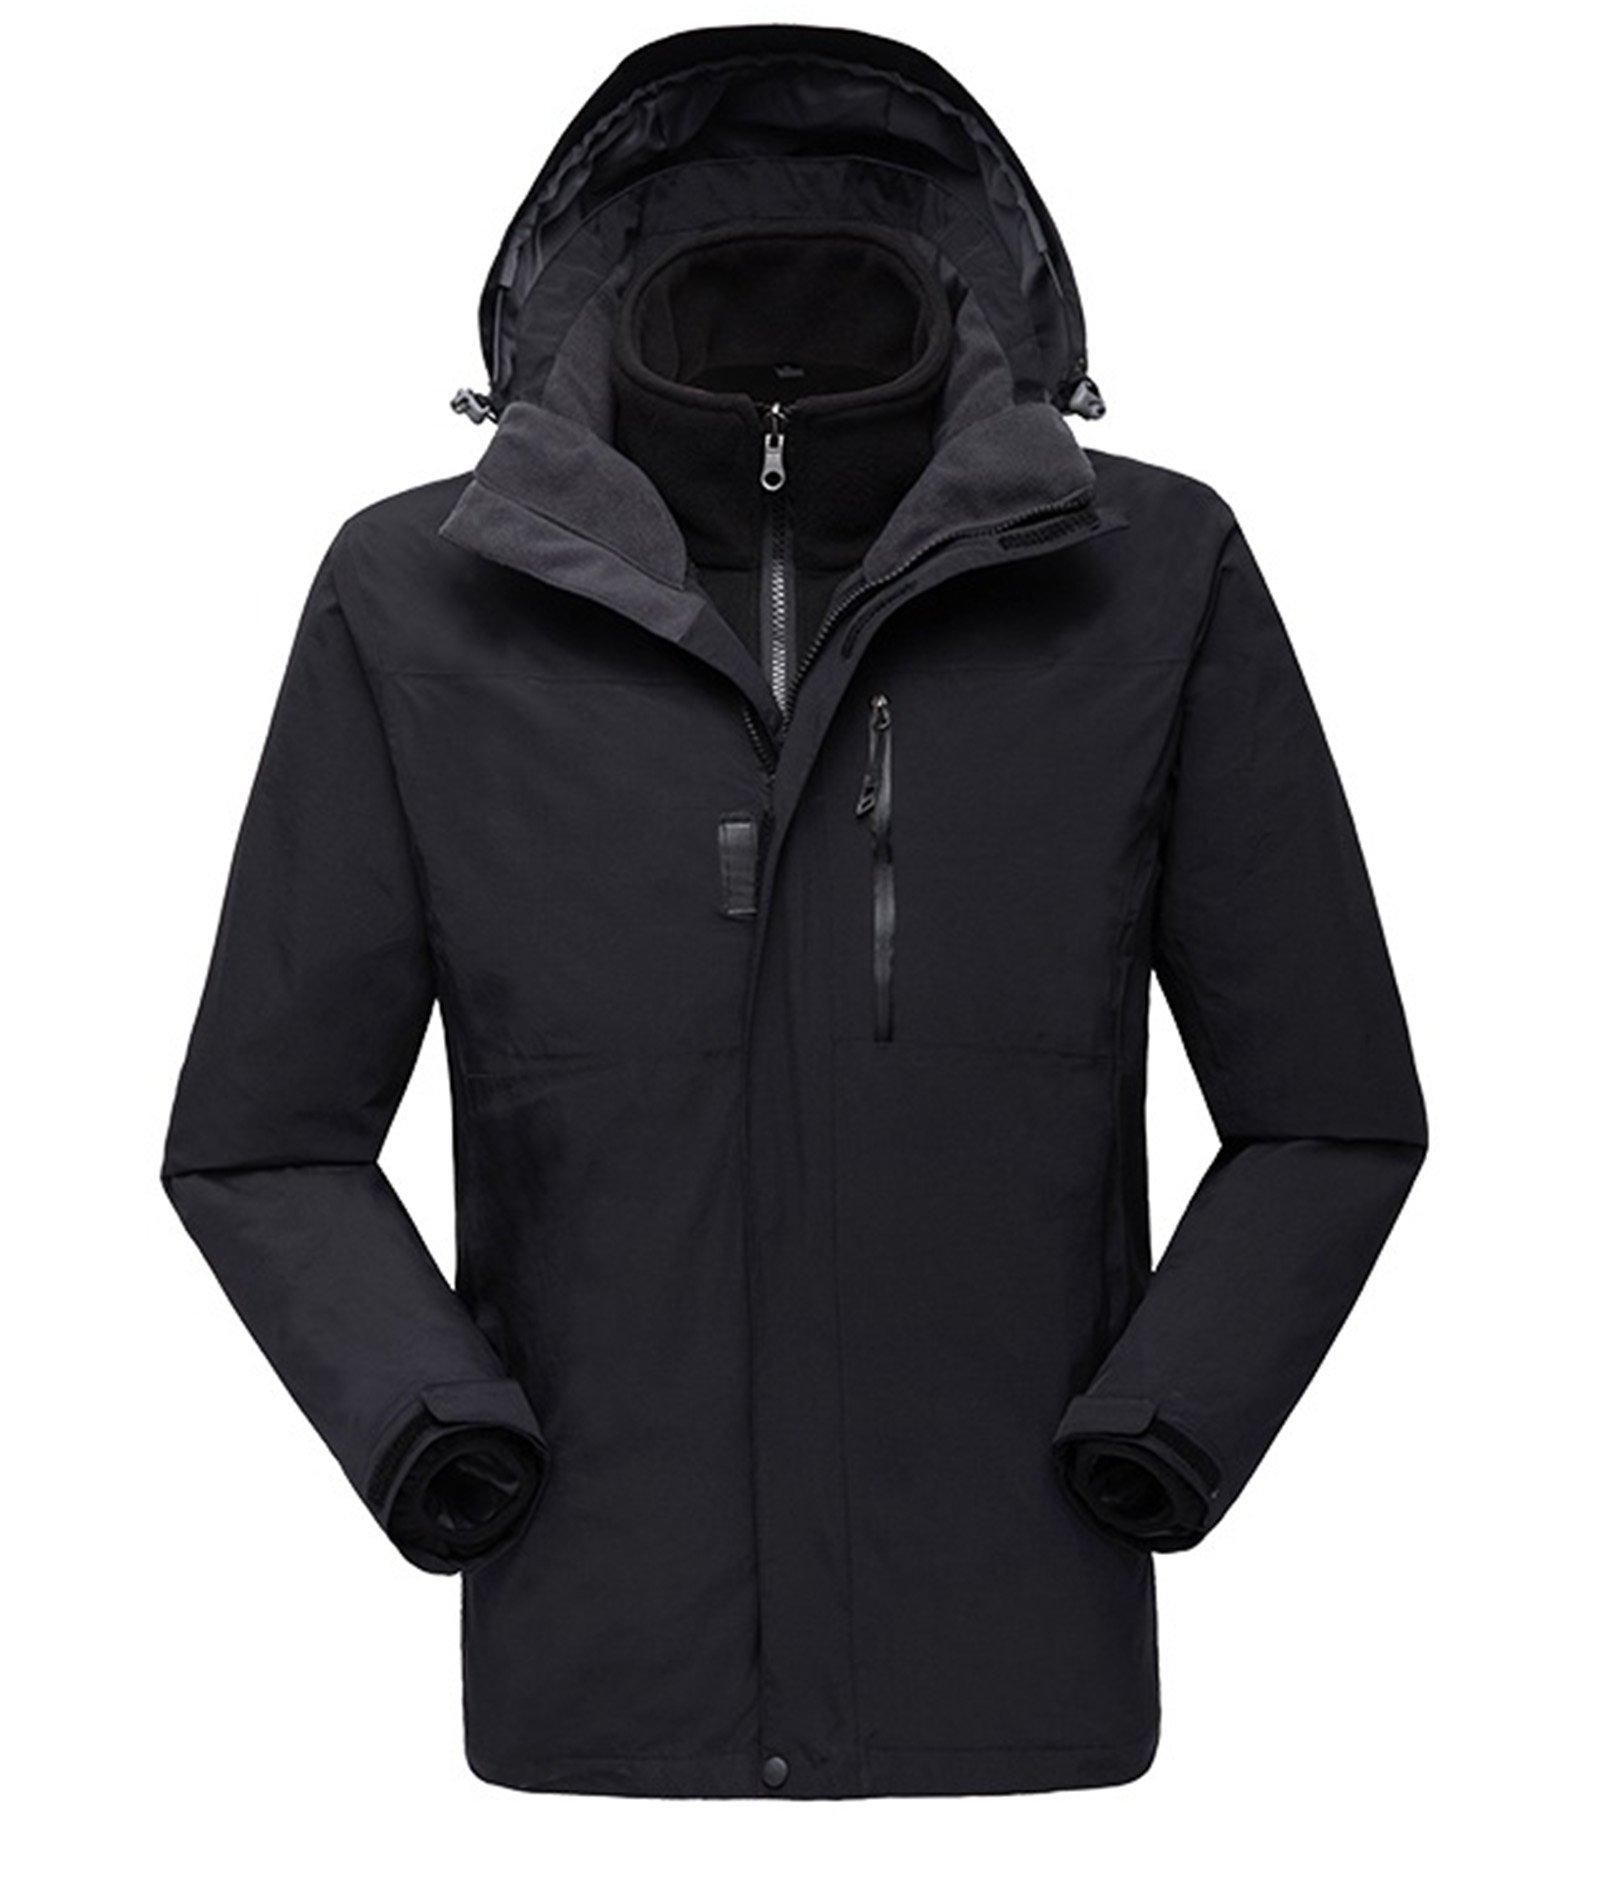 Sportswear Men's Interchange Jacket with Detachable Storm Hood Black X-Large